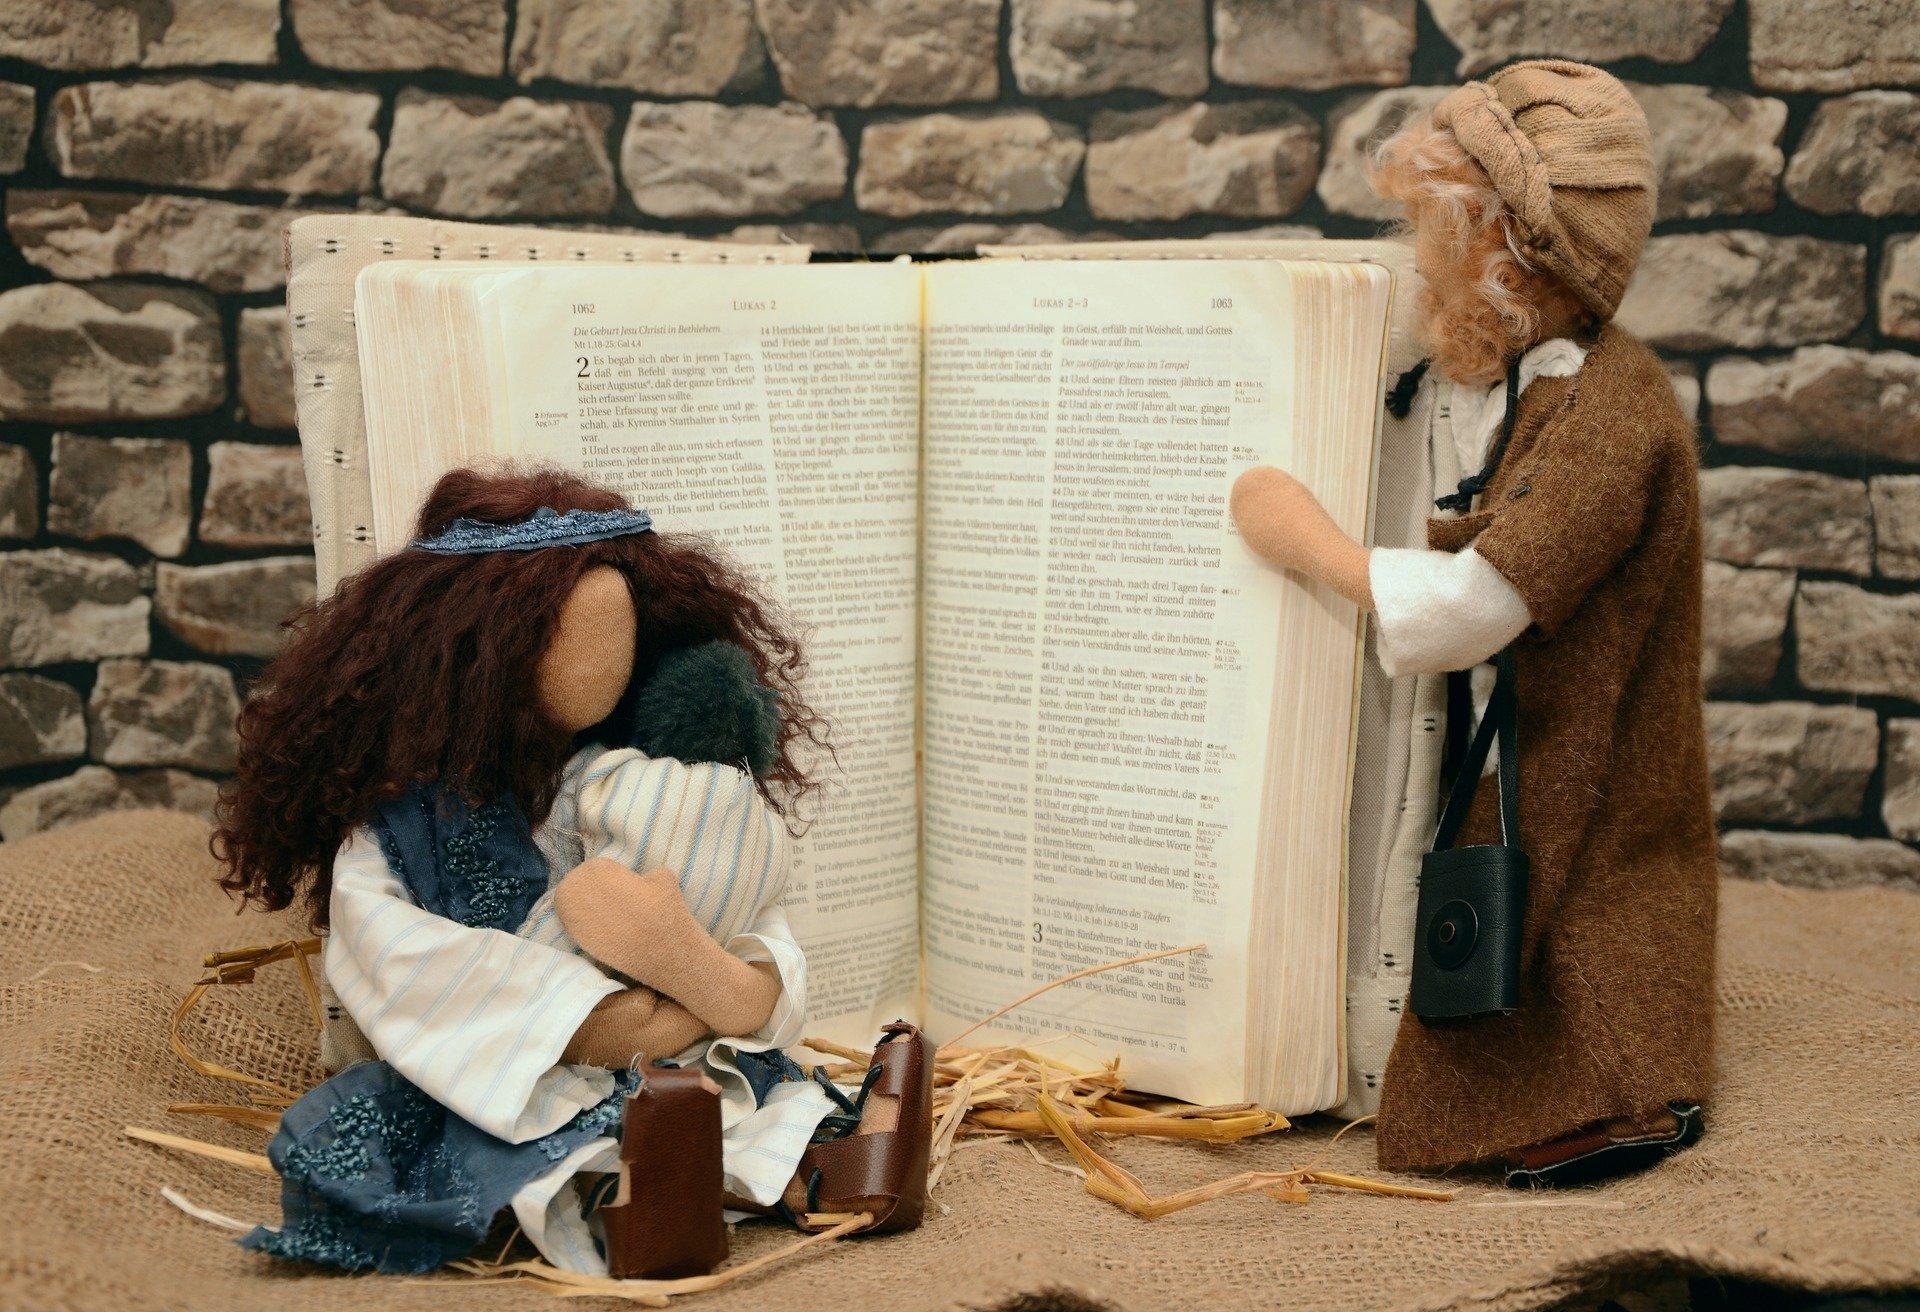 Bible, Mary, Joseph, Jesus characters